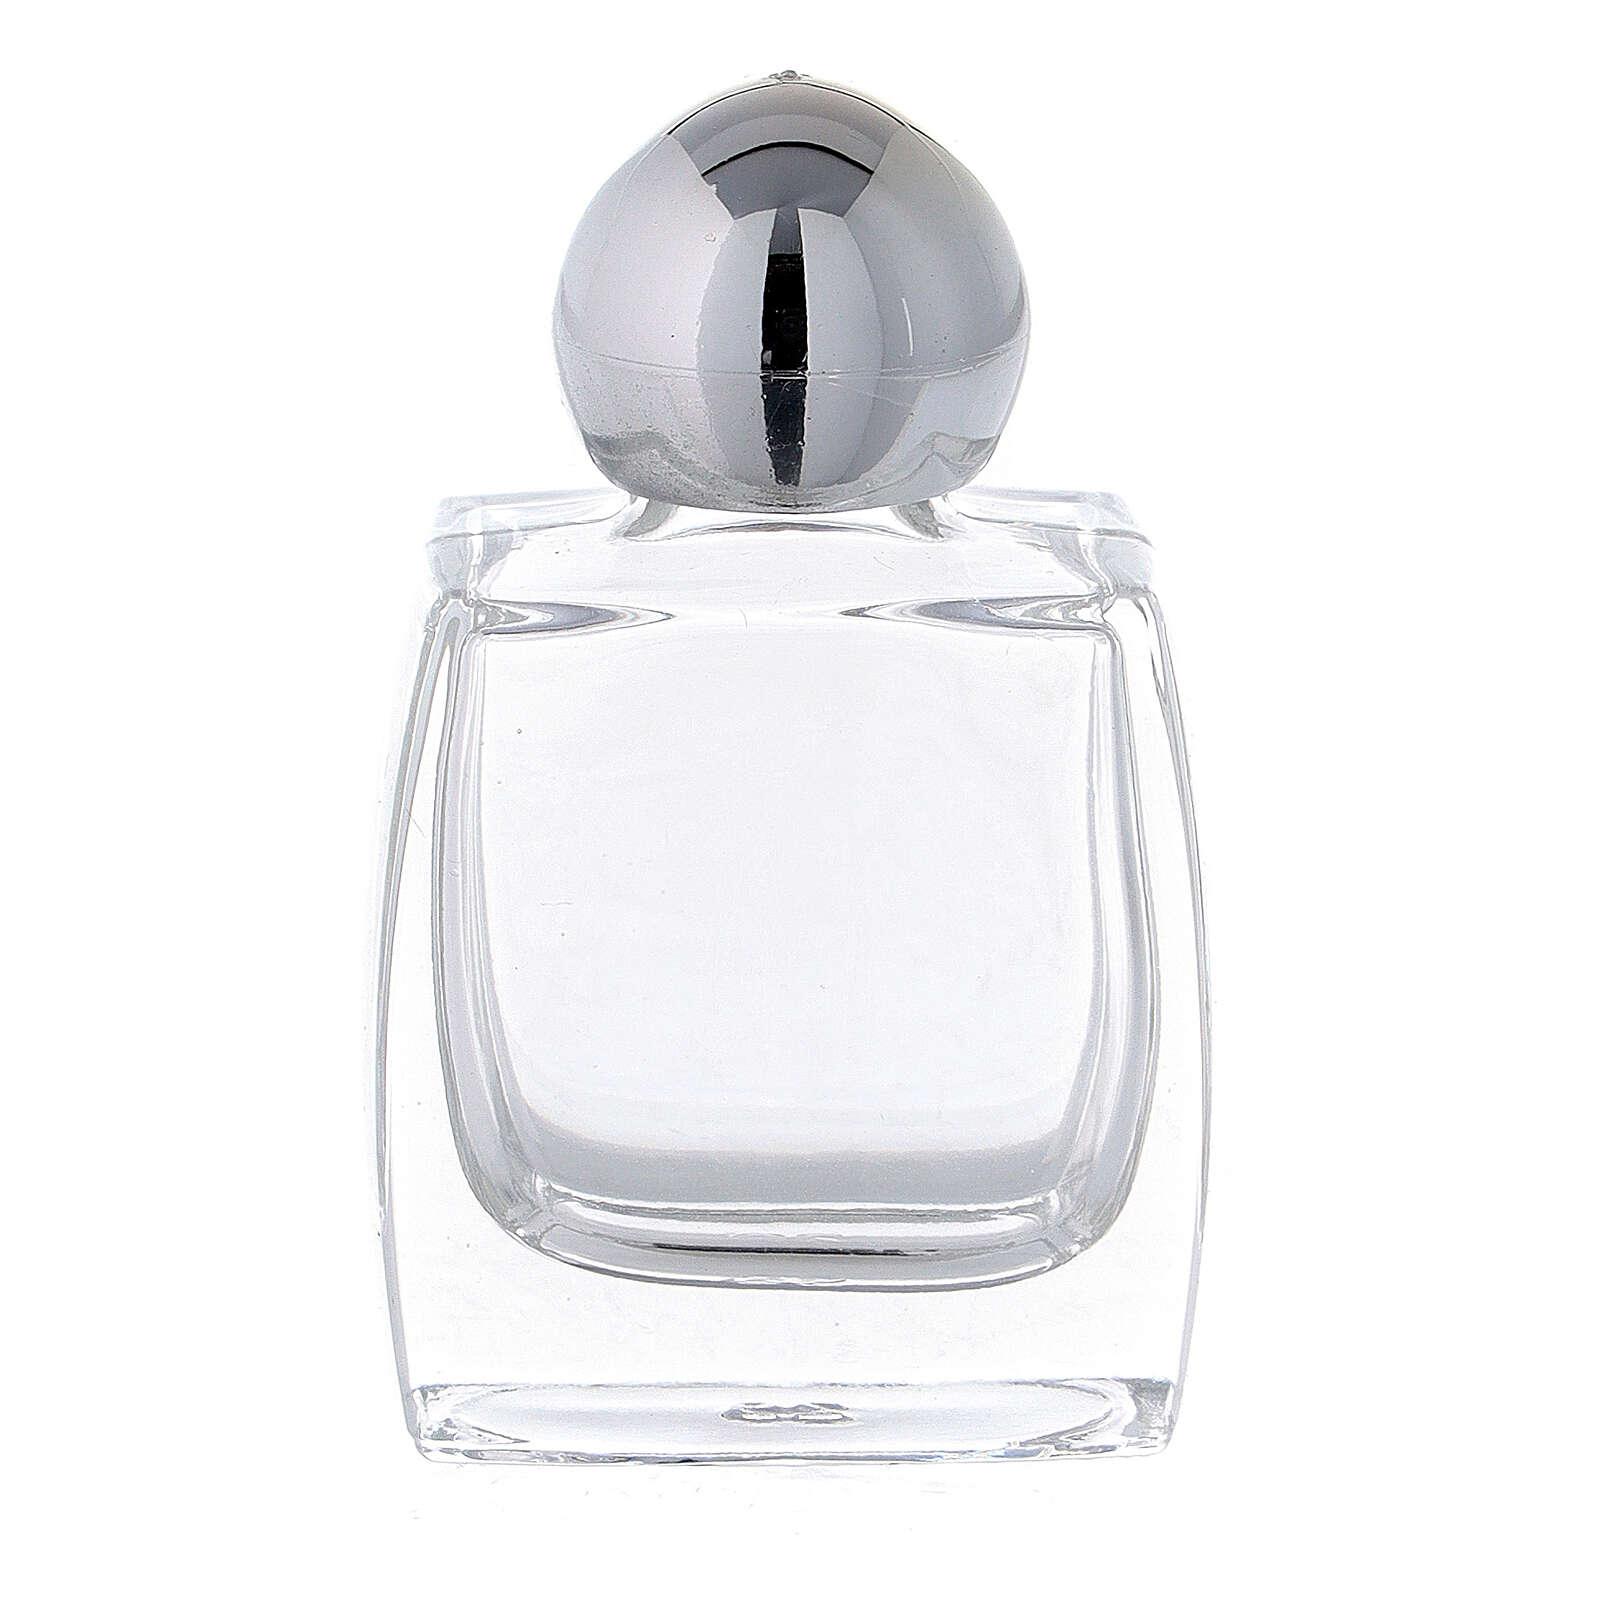 Botella agua bendita vidrio tapón plata 10 ml (CAJA 50 PIEZAS) 3